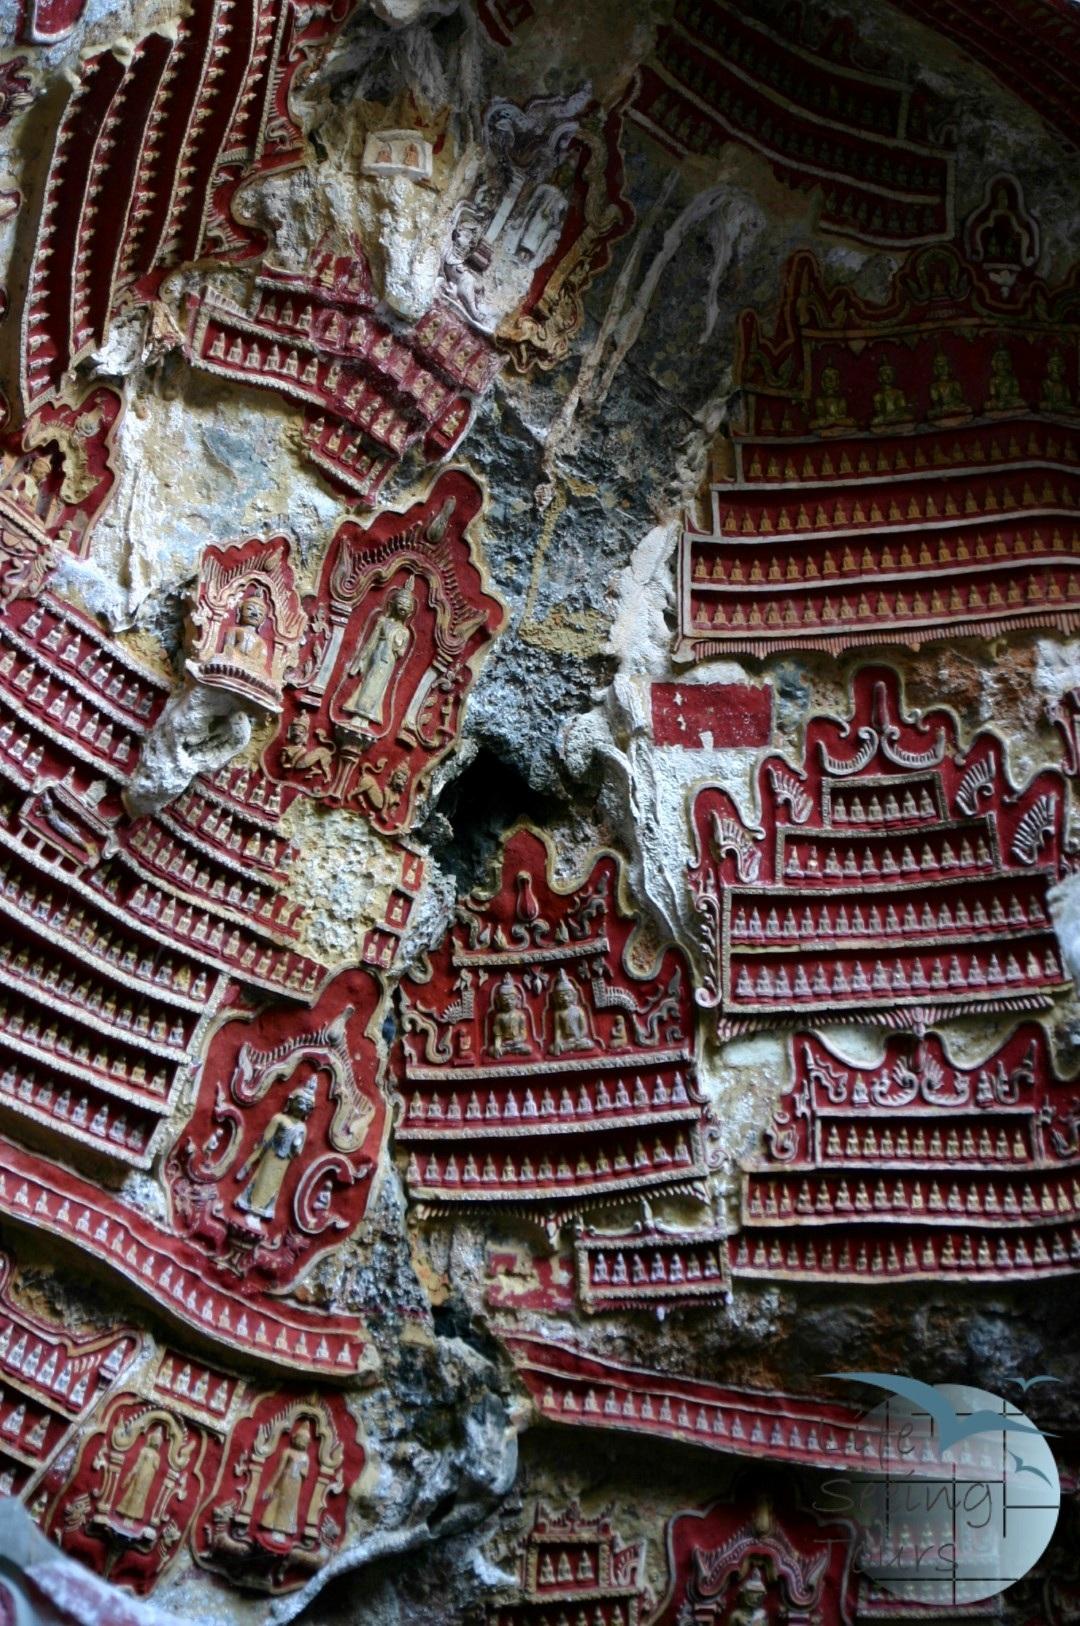 Kaw Goon Cave